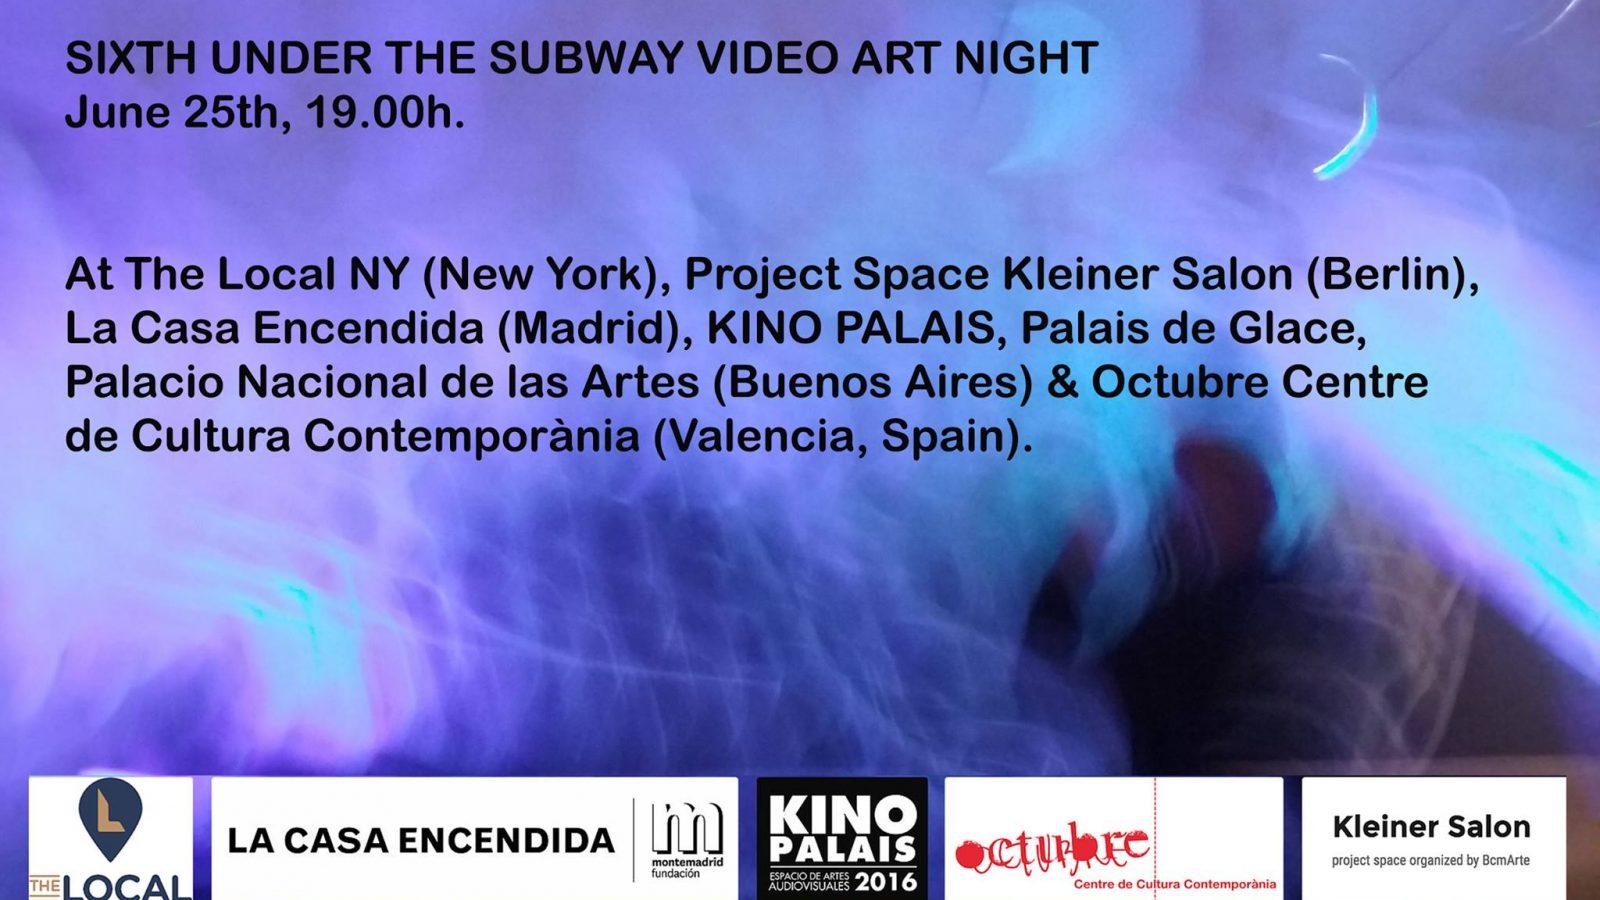 Under the Subway Video Art Night 2016